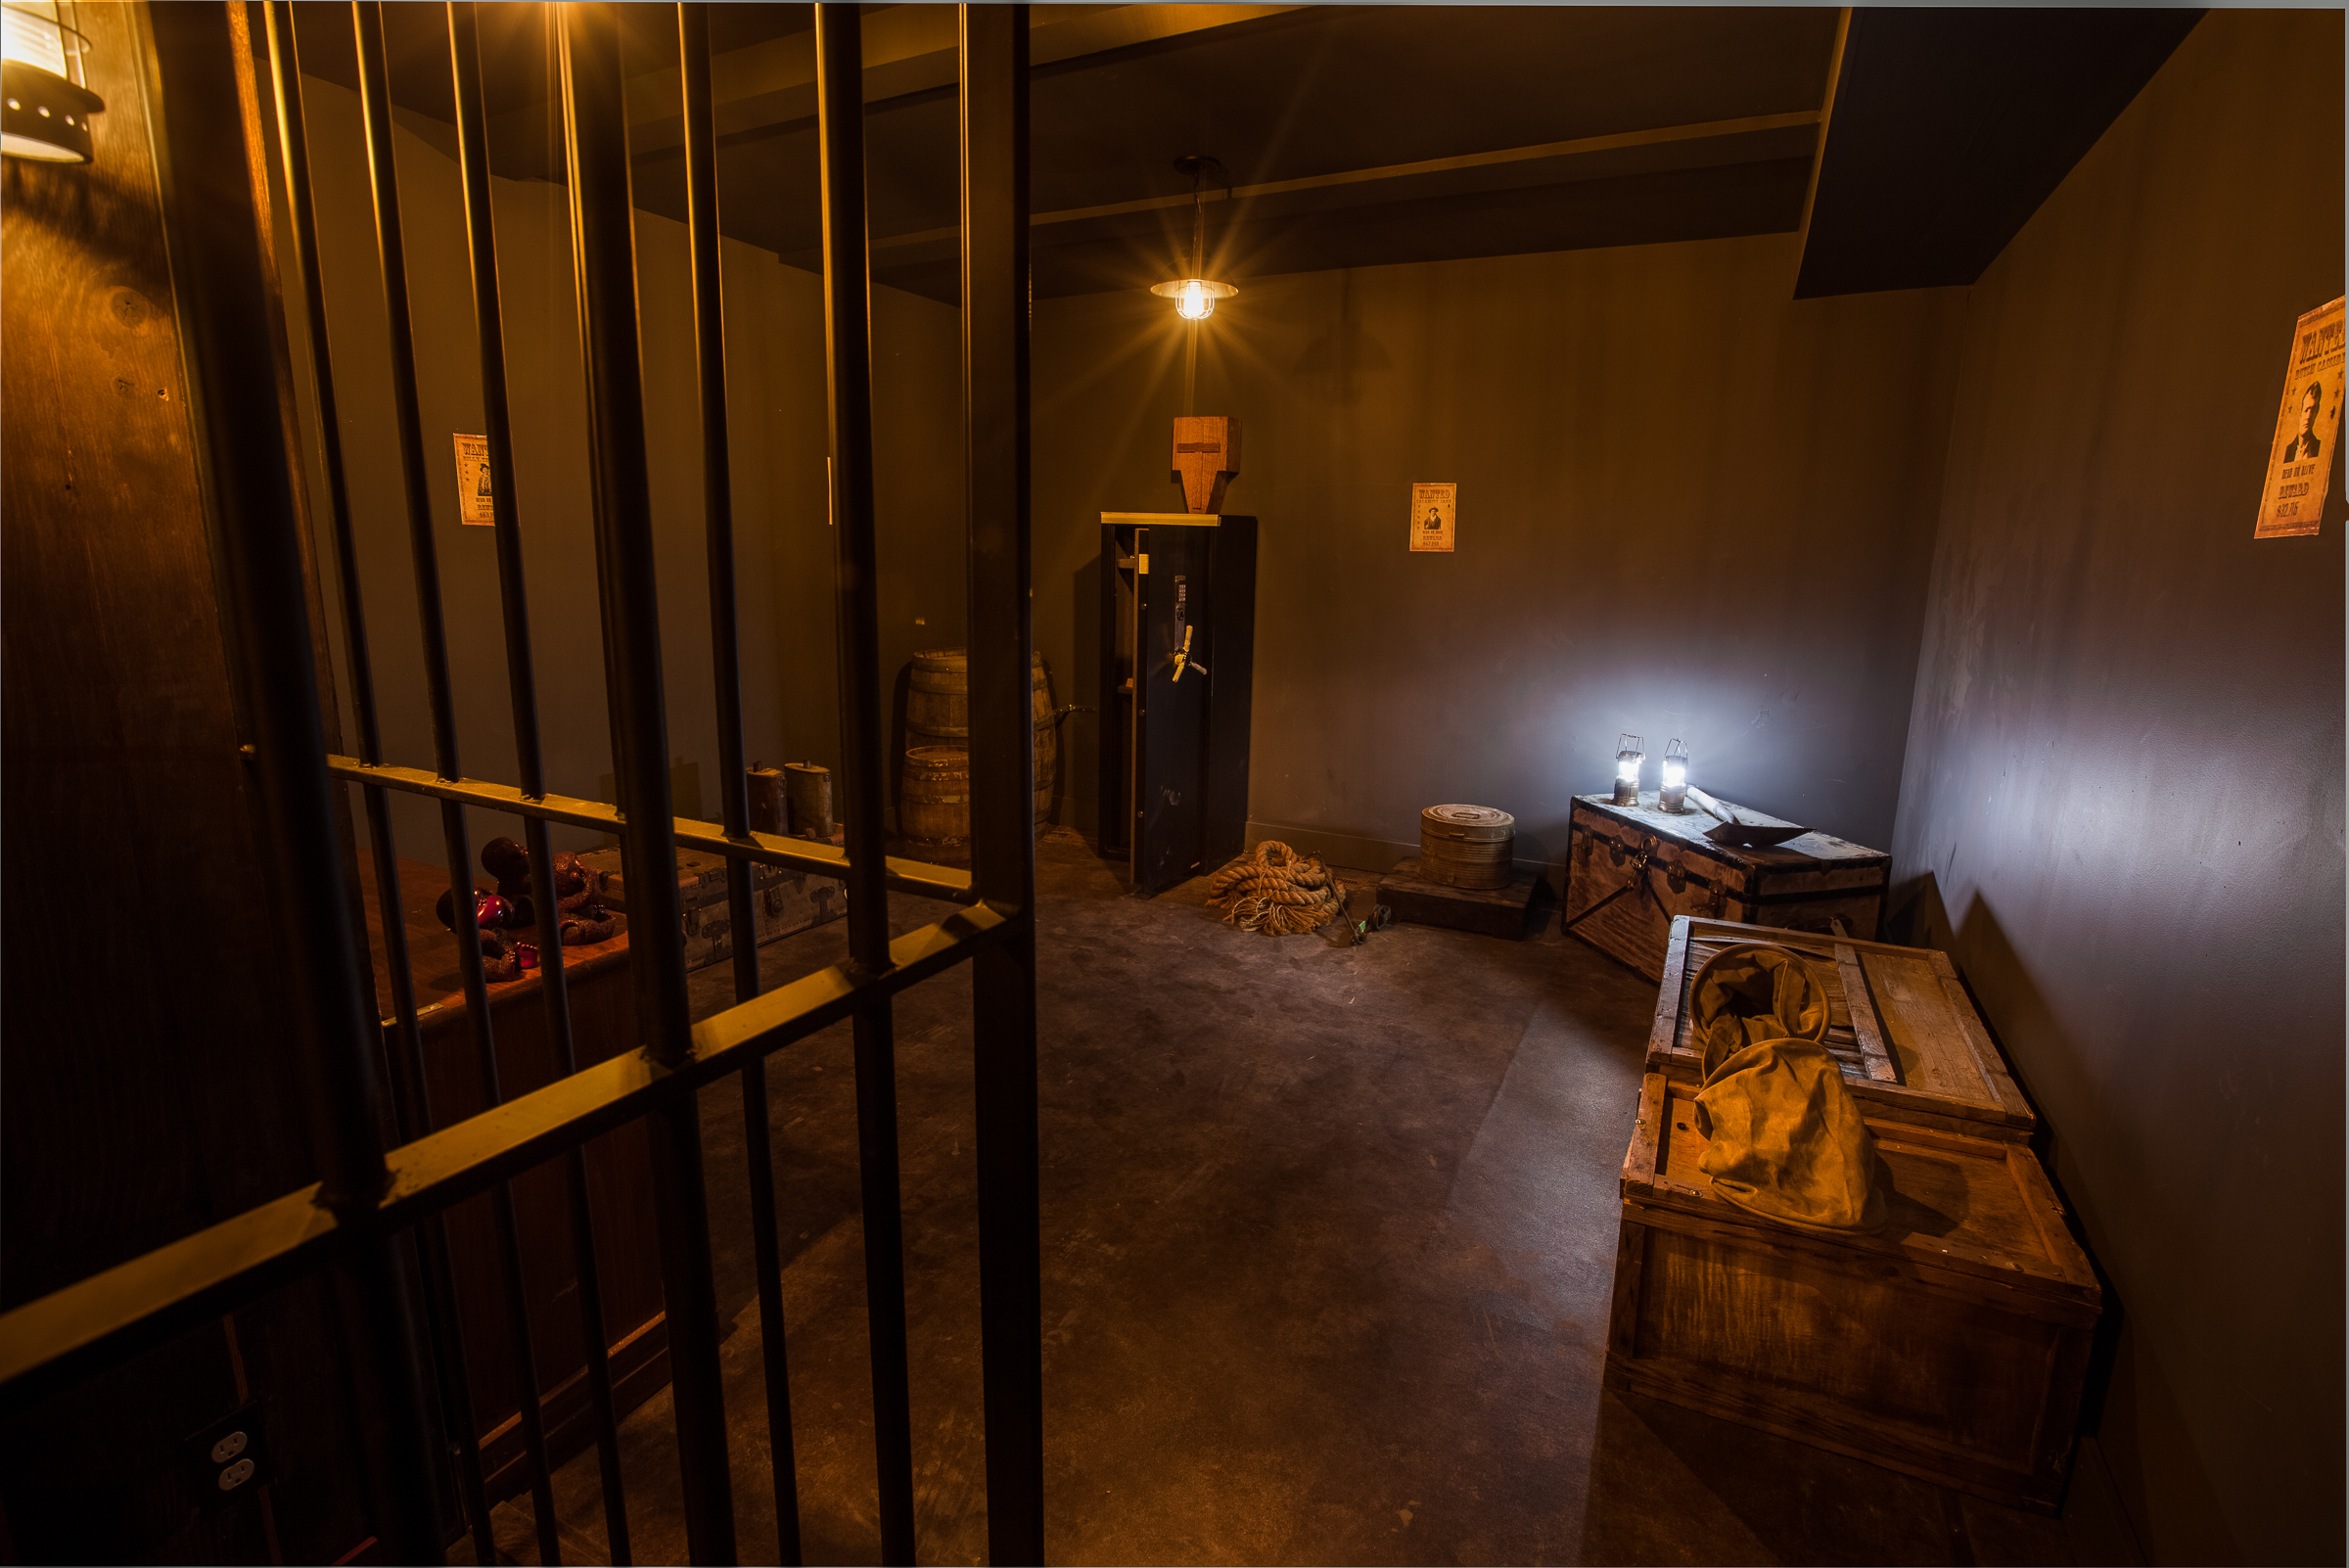 The Locked Room Lair Of The Minotaur